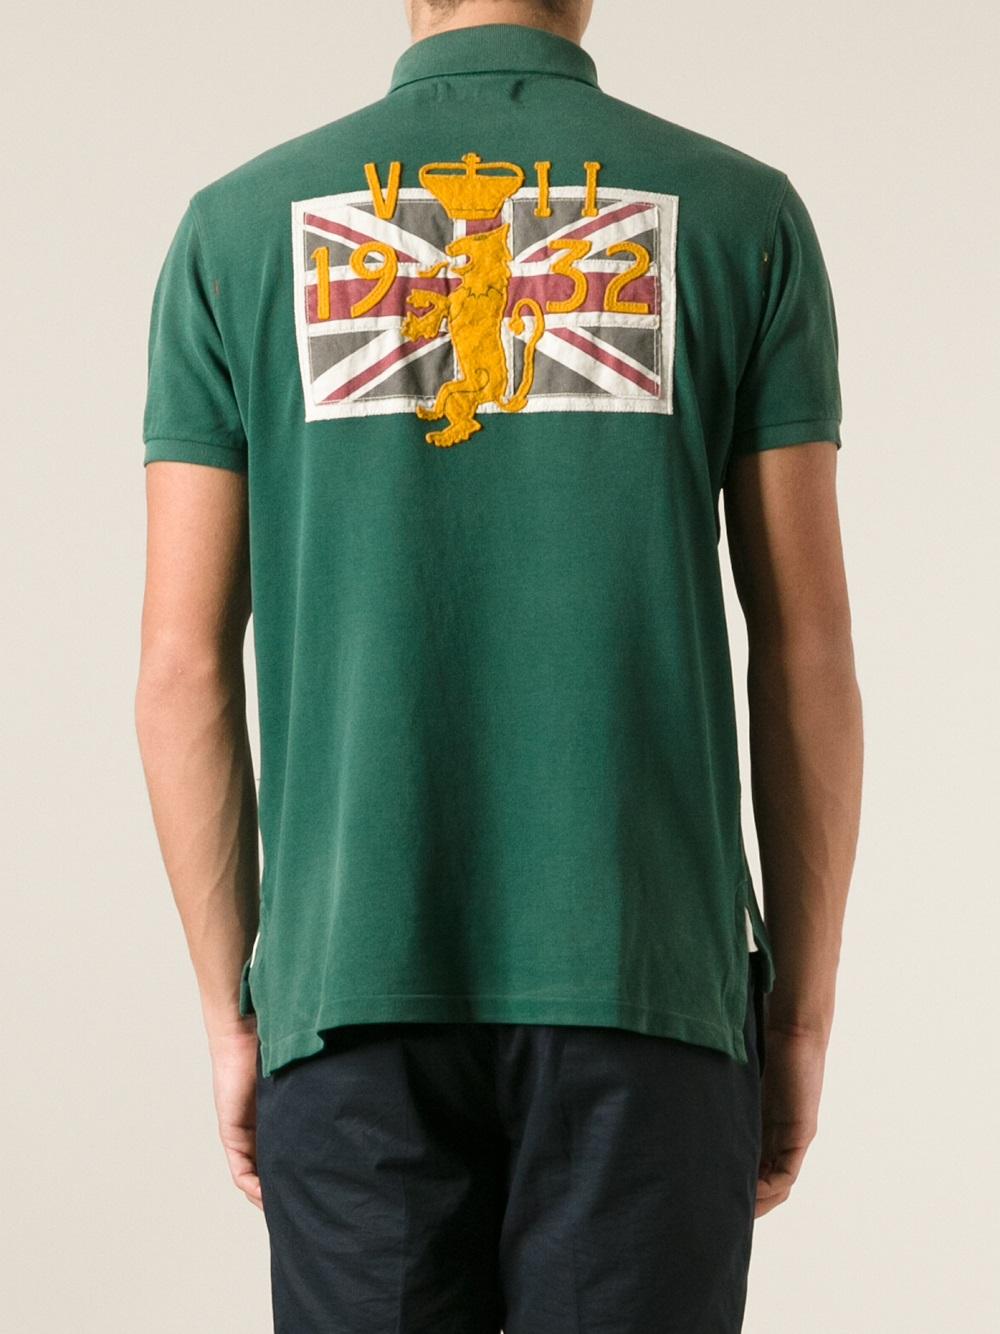 Lyst Polo Ralph Lauren Short Sleeve Polo Shirt In Green